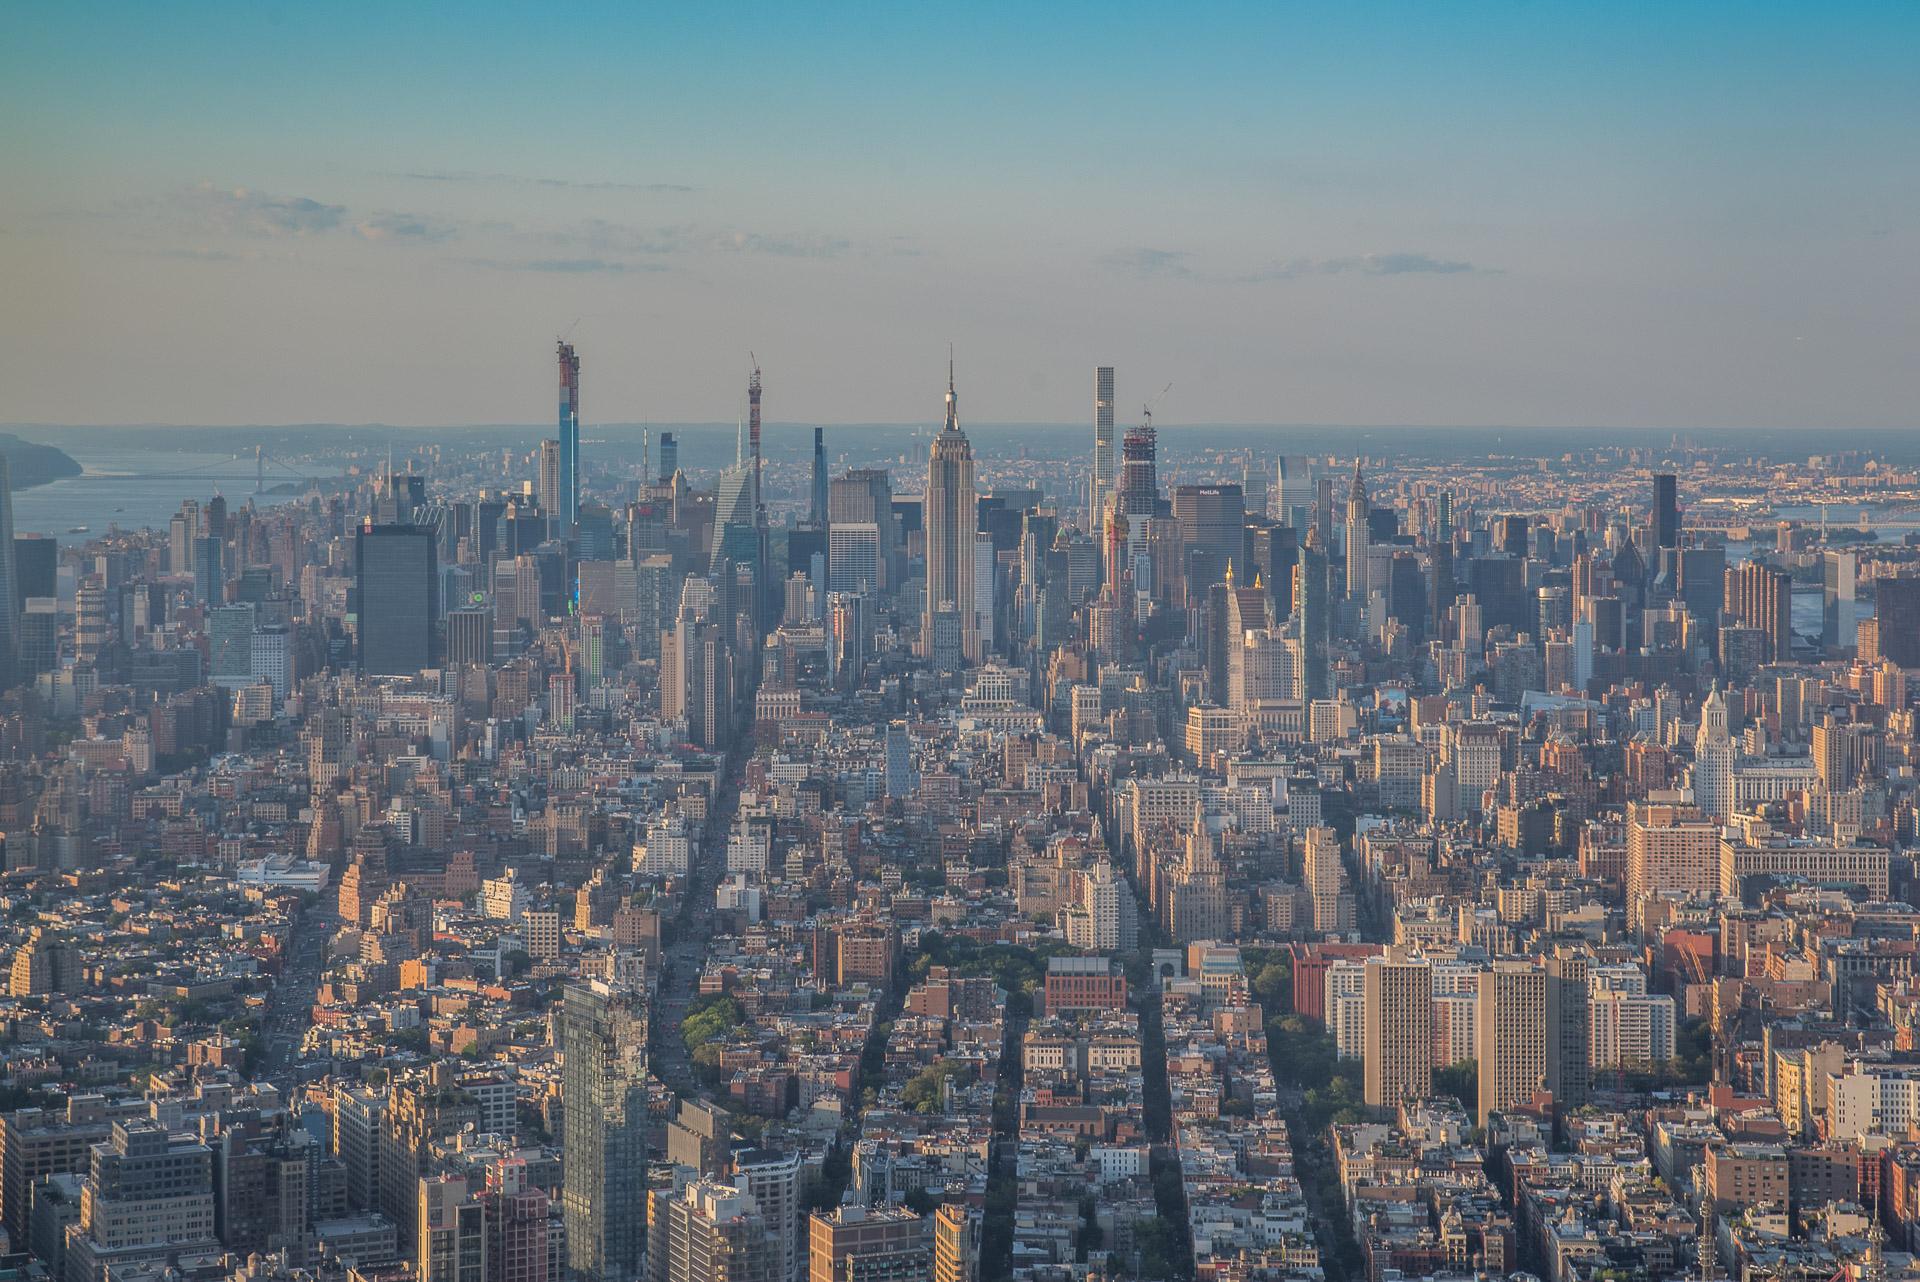 nueva-york-rascacielos-13.jpg